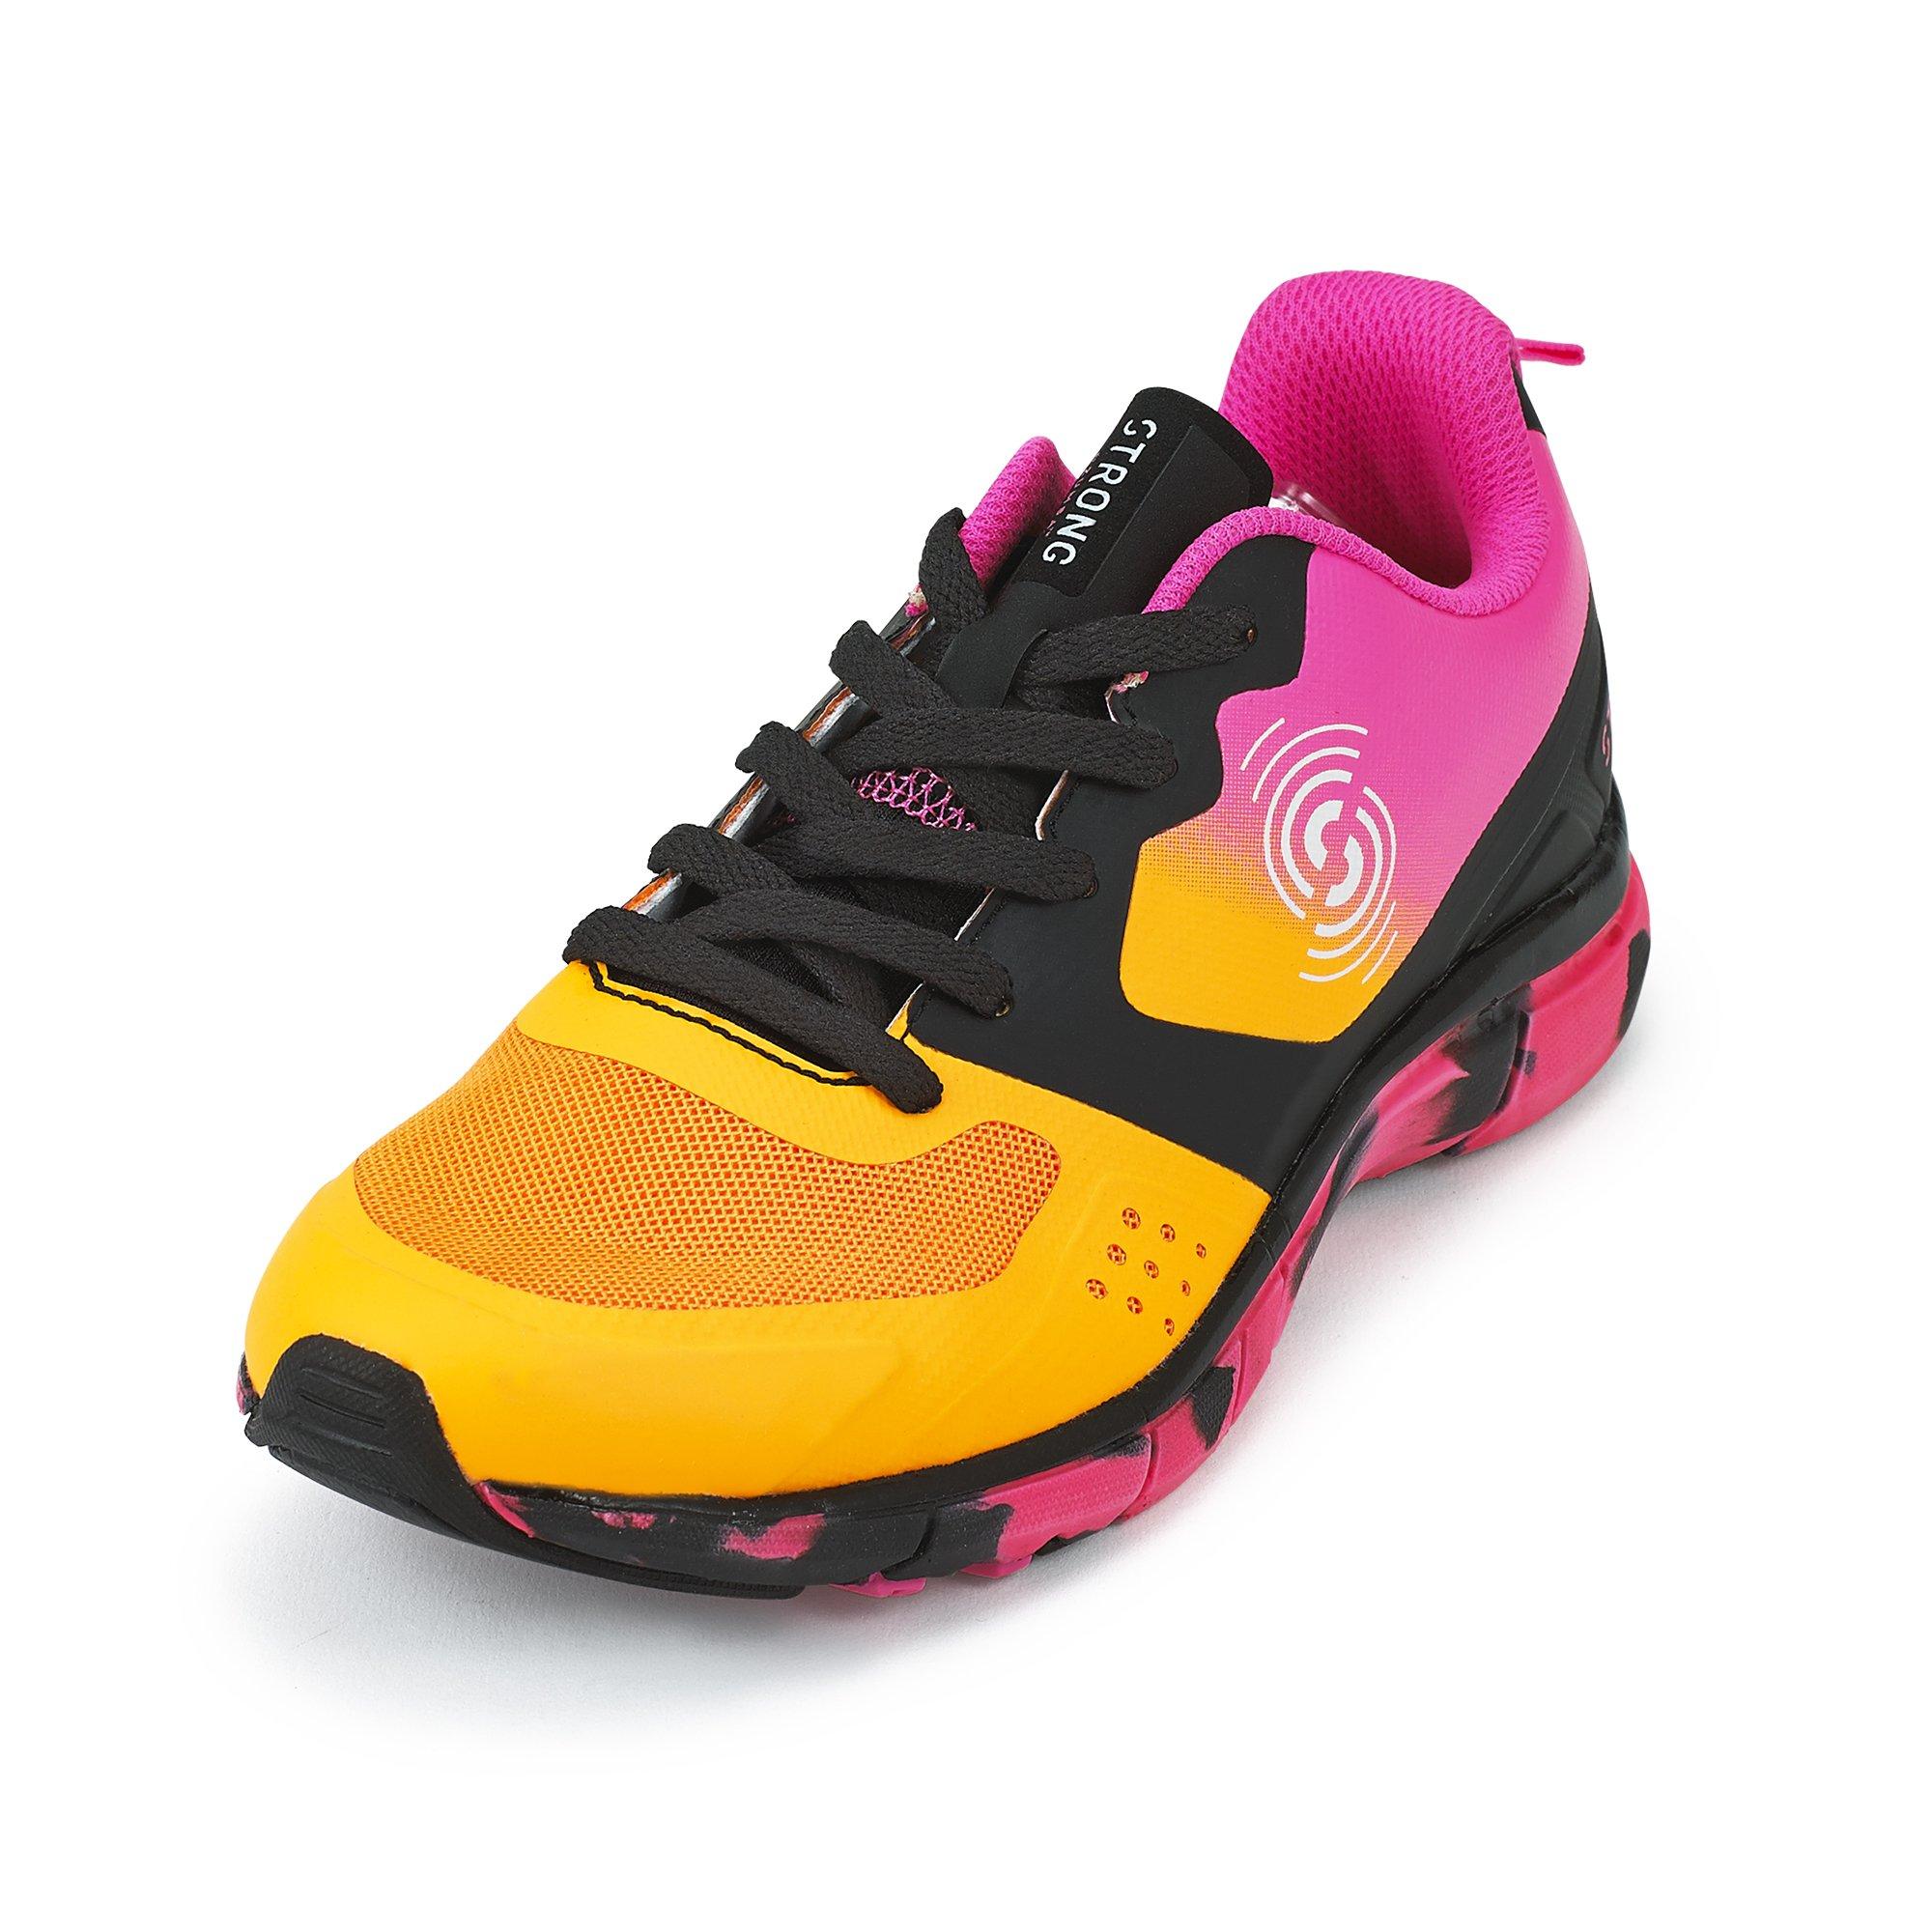 Zumba Fitness LLC Women's Strong by Zumba Fly Fit Sneaker, Orange, 7 Regular US